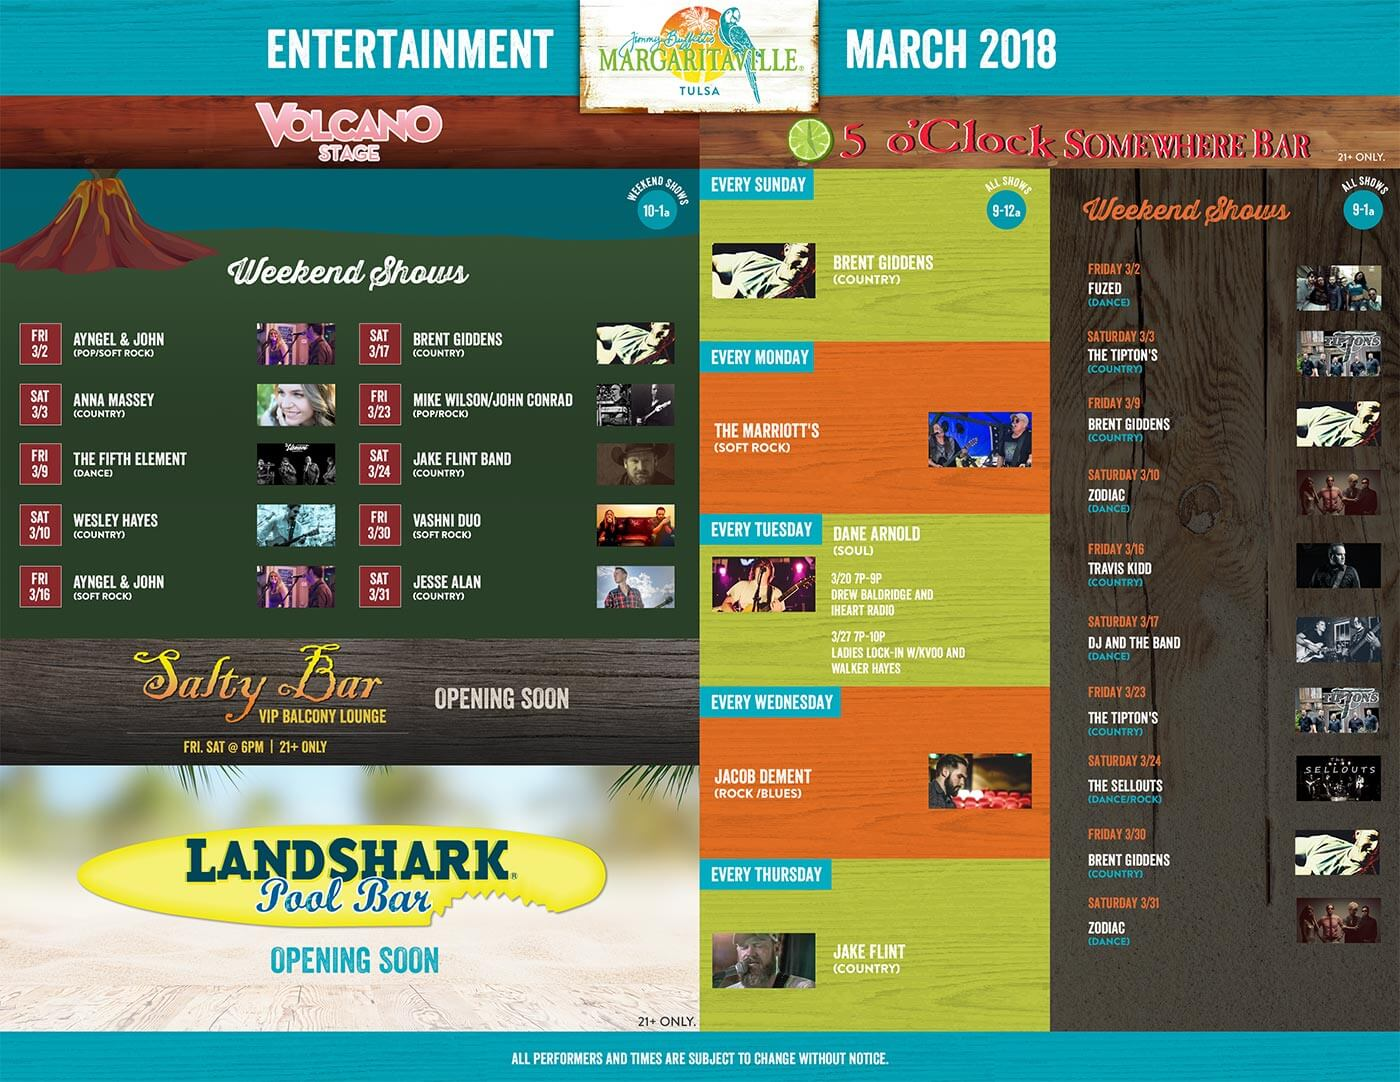 Margaritaville Tulsa March Calendar of Events